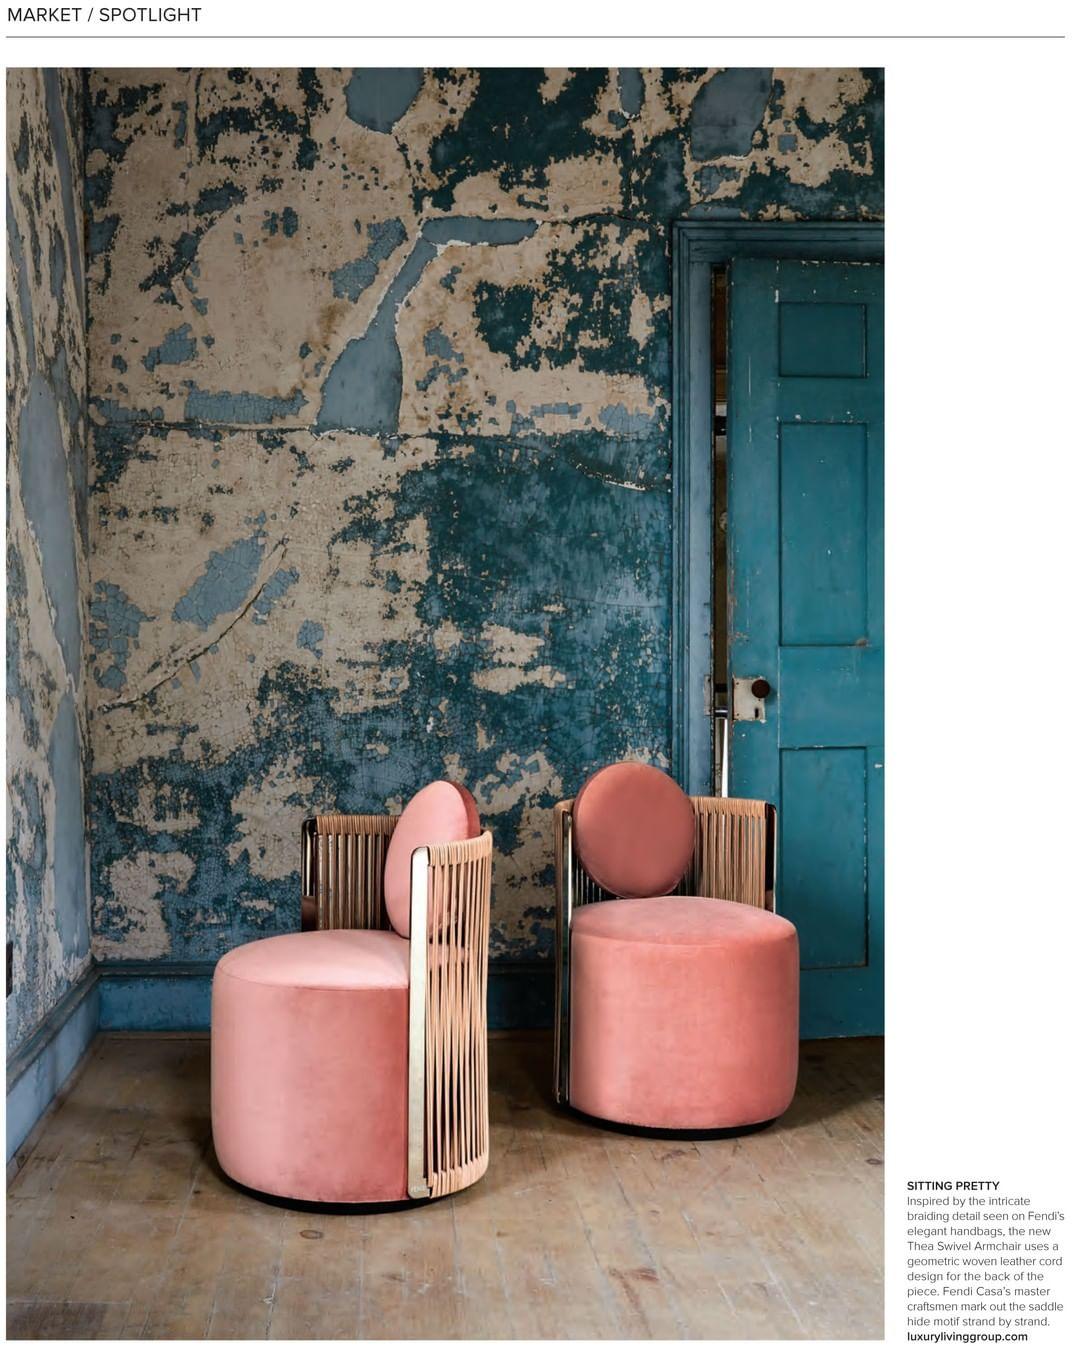 #Thea armchair by #FENDICasa